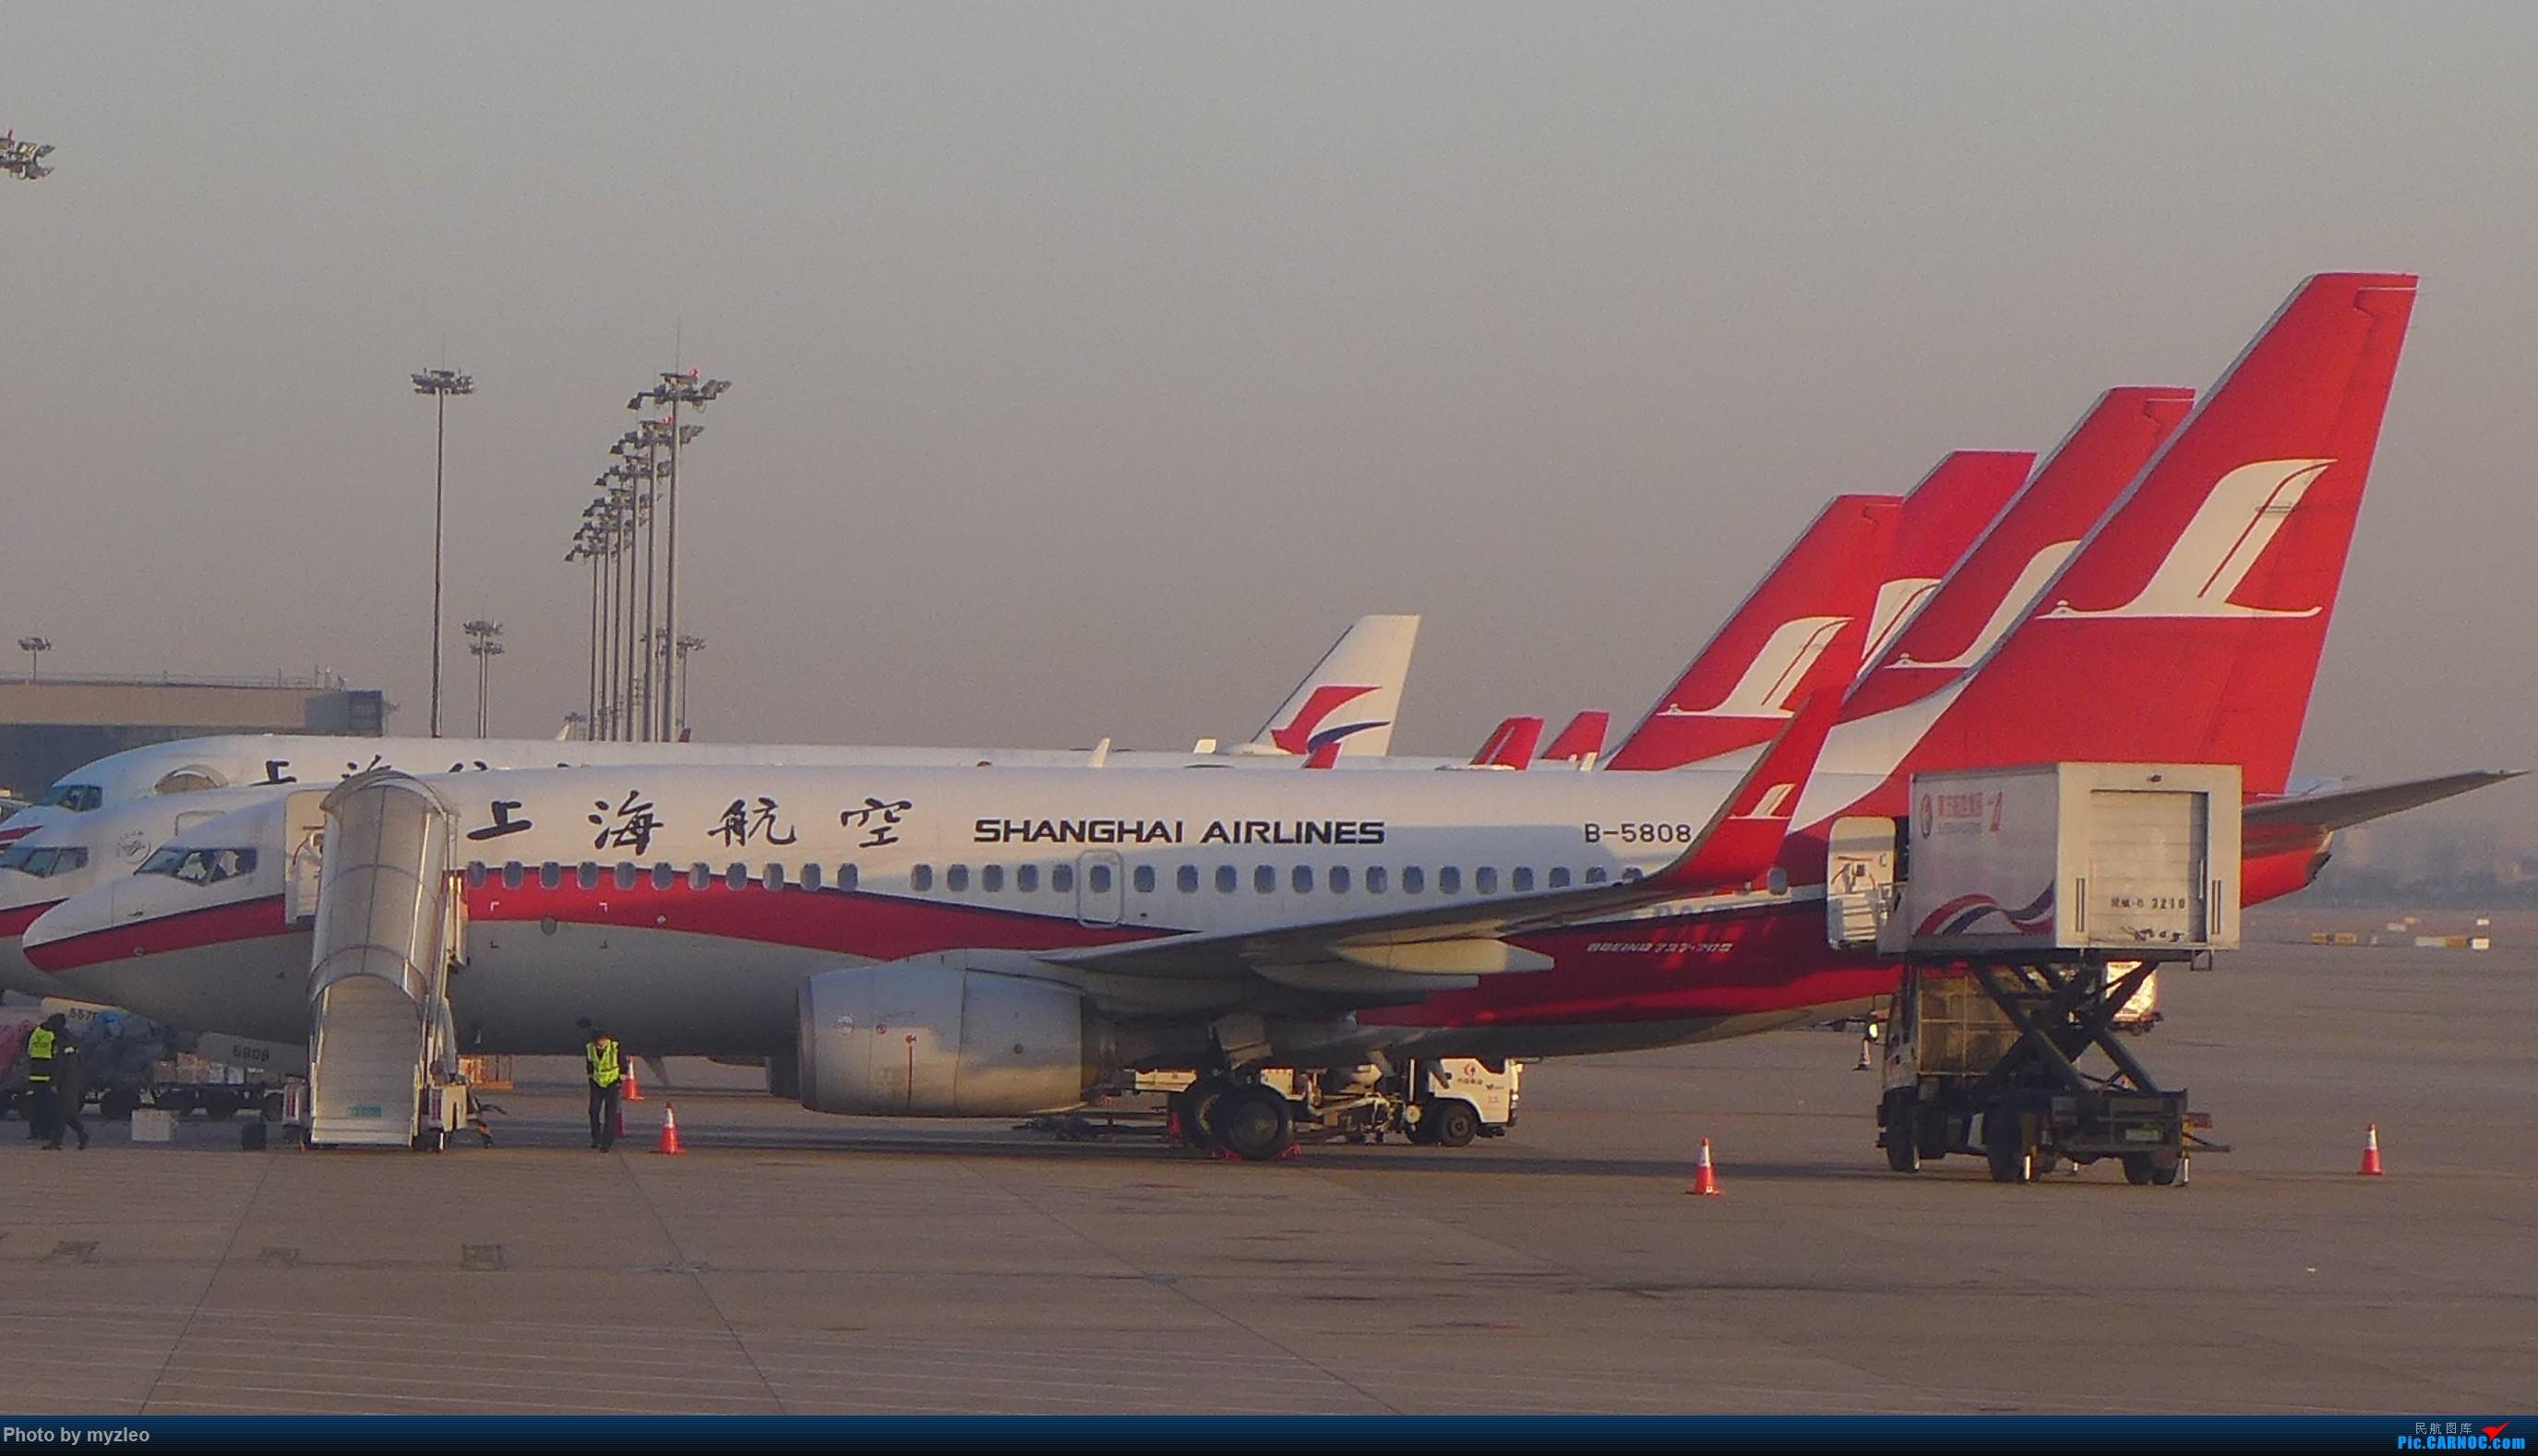 Re:[原创]【myzleo的游记1】六天五晚广州行——SHA-CAN上航商务舱初体验+广州城内 BOEING 737-700 B-5808 中国上海虹桥国际机场